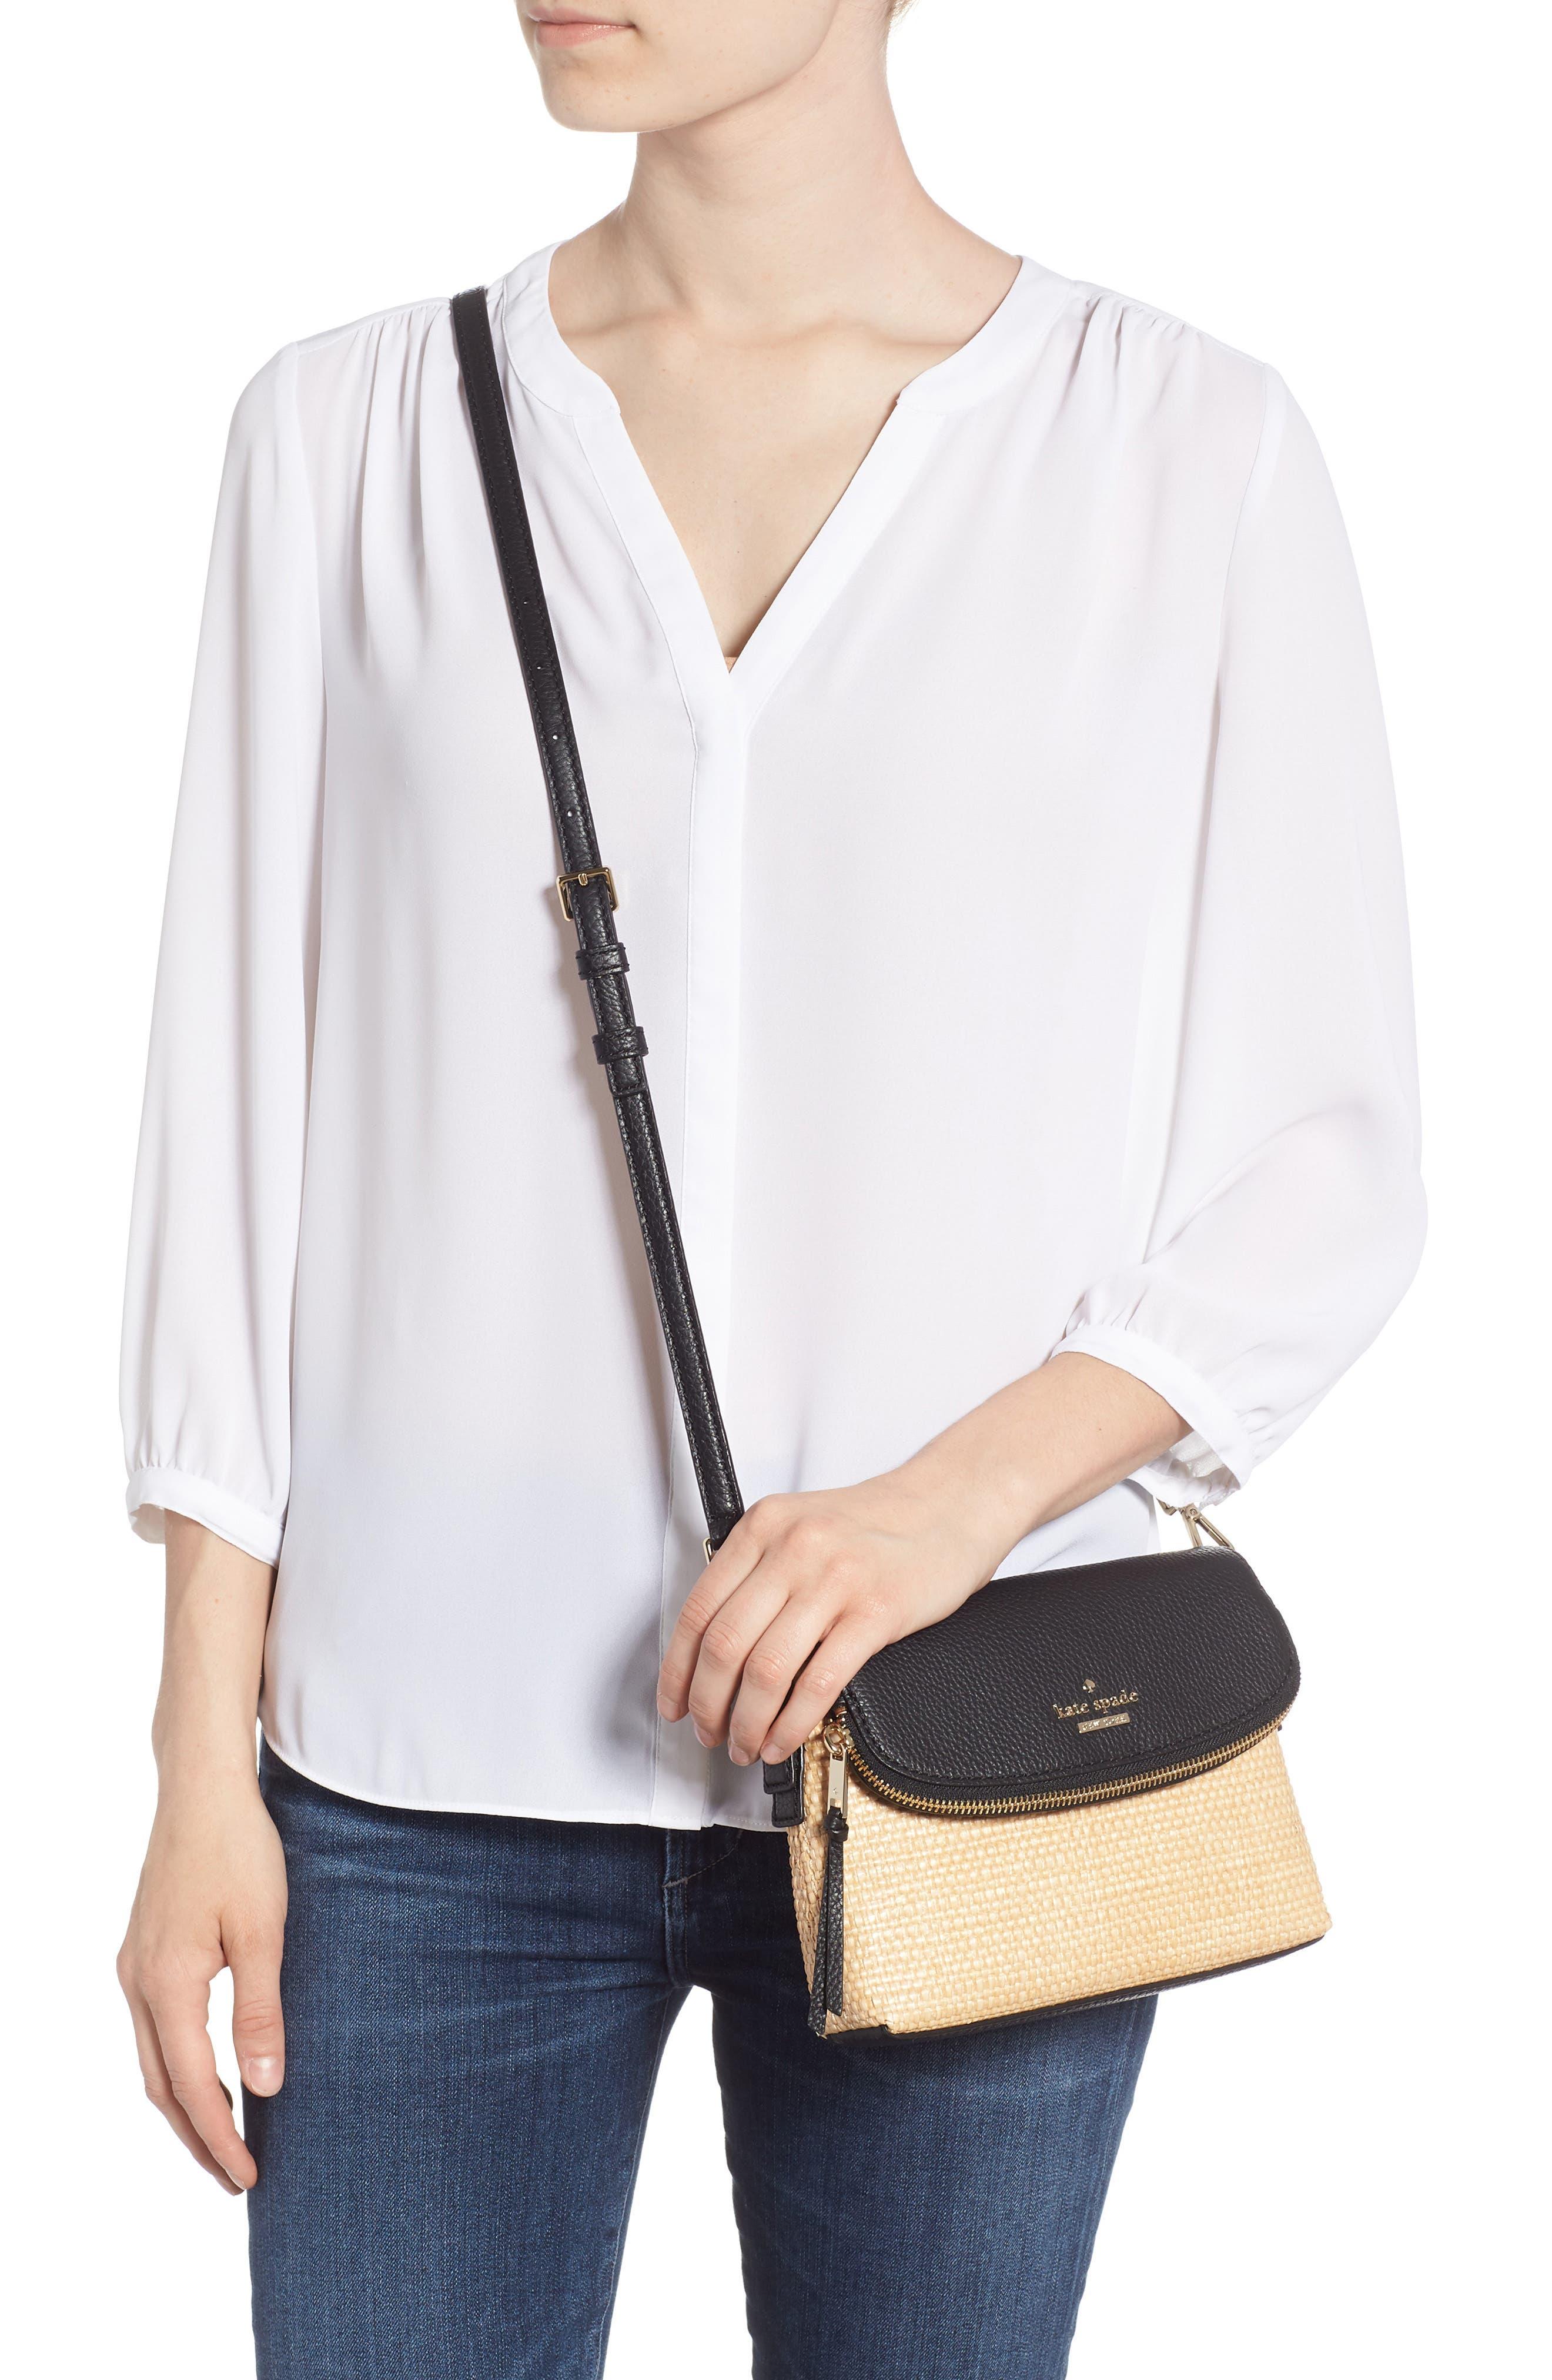 jackson street – harlyn straw & leather crossbody bag,                             Alternate thumbnail 2, color,